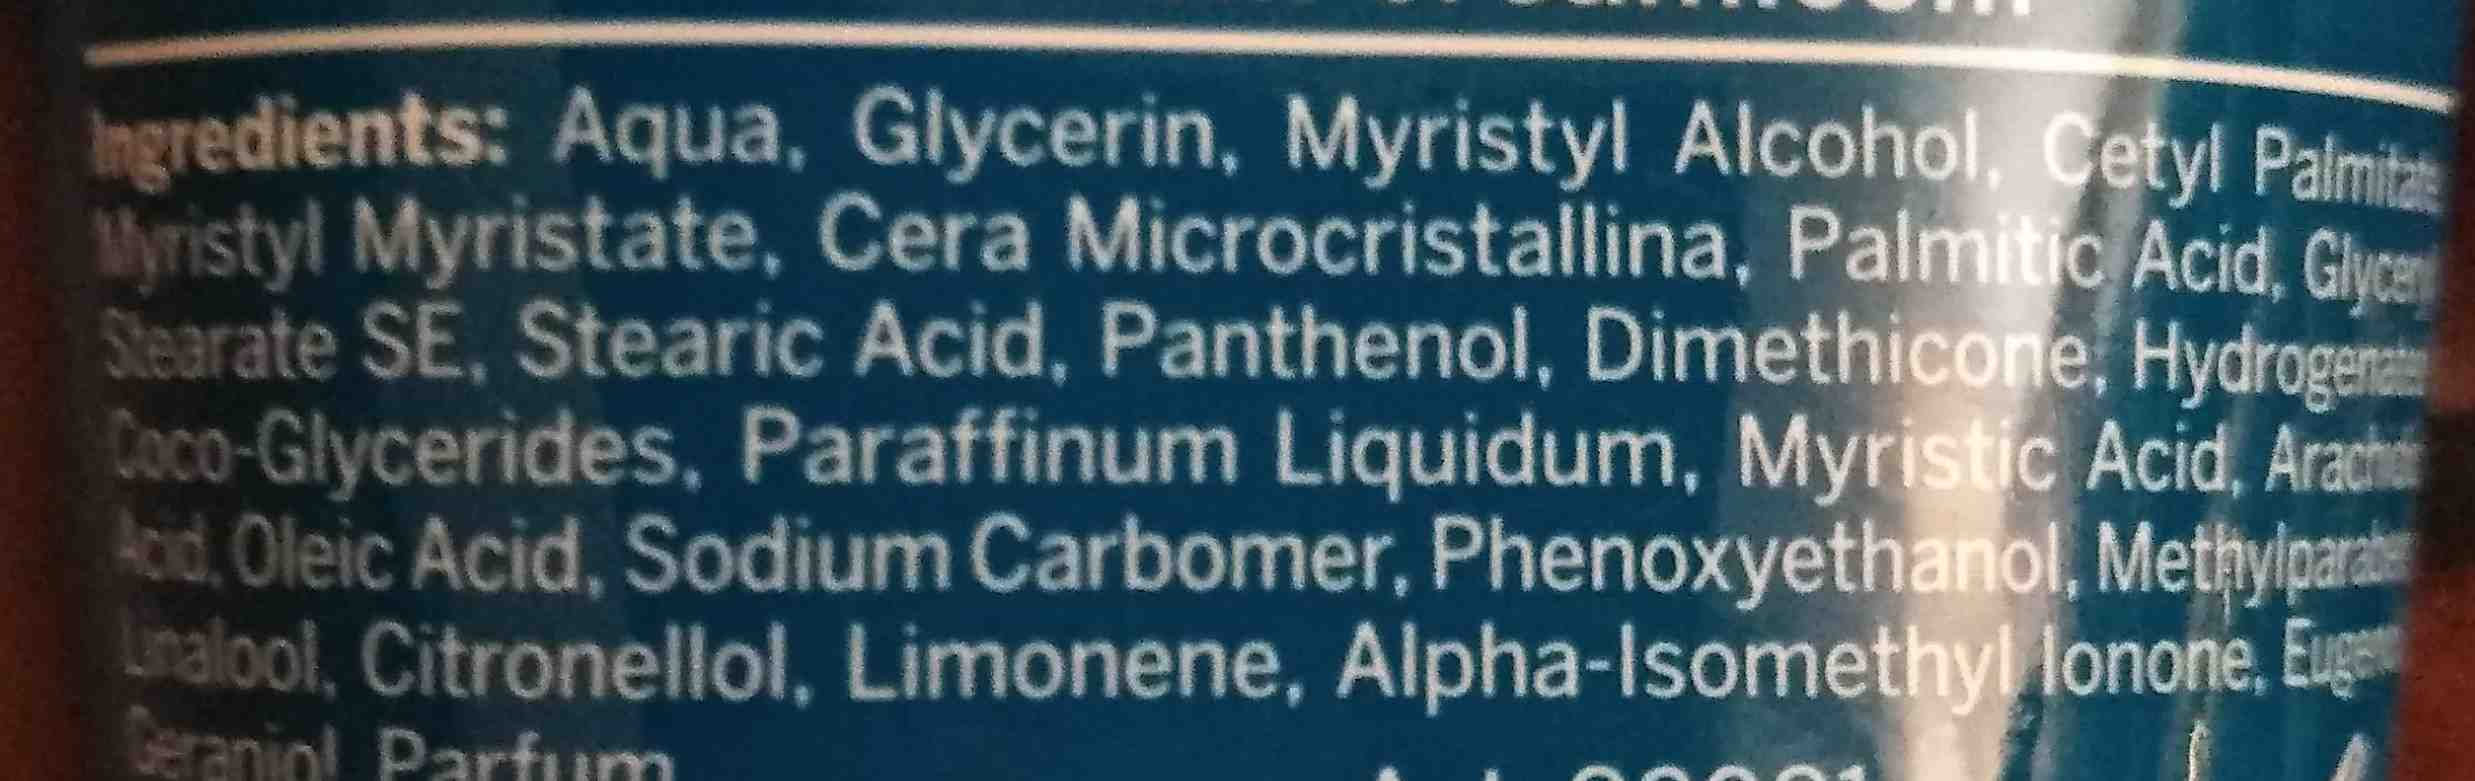 atrix - Ingredients